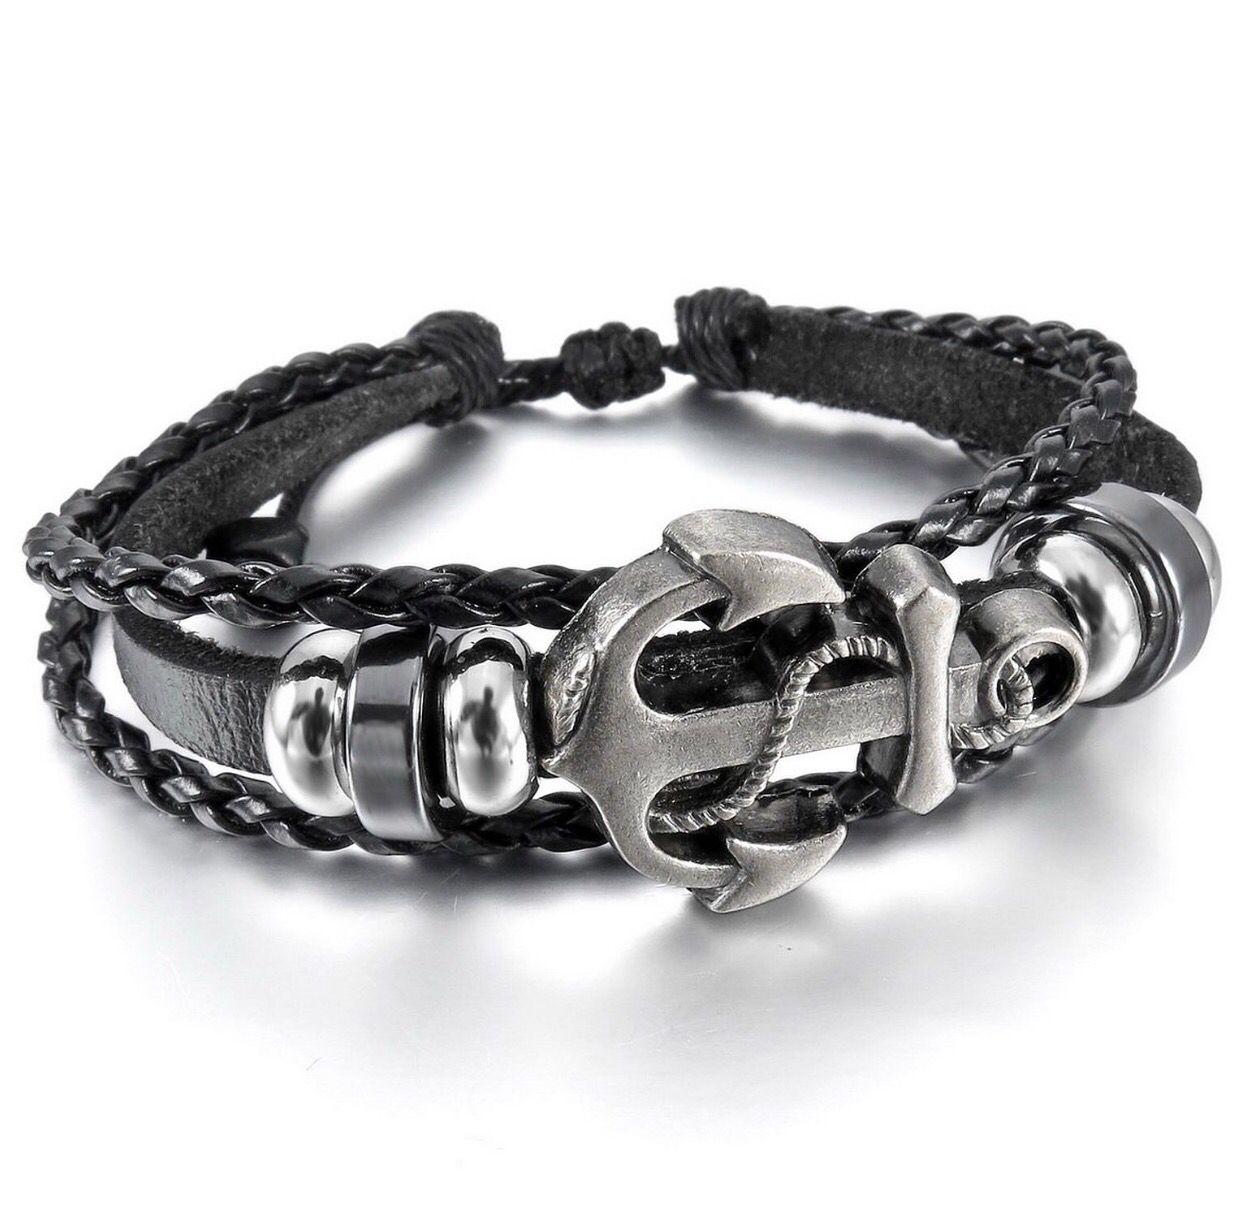 Menwomenus alloy genuine leather bracelet bangle cuff cord black